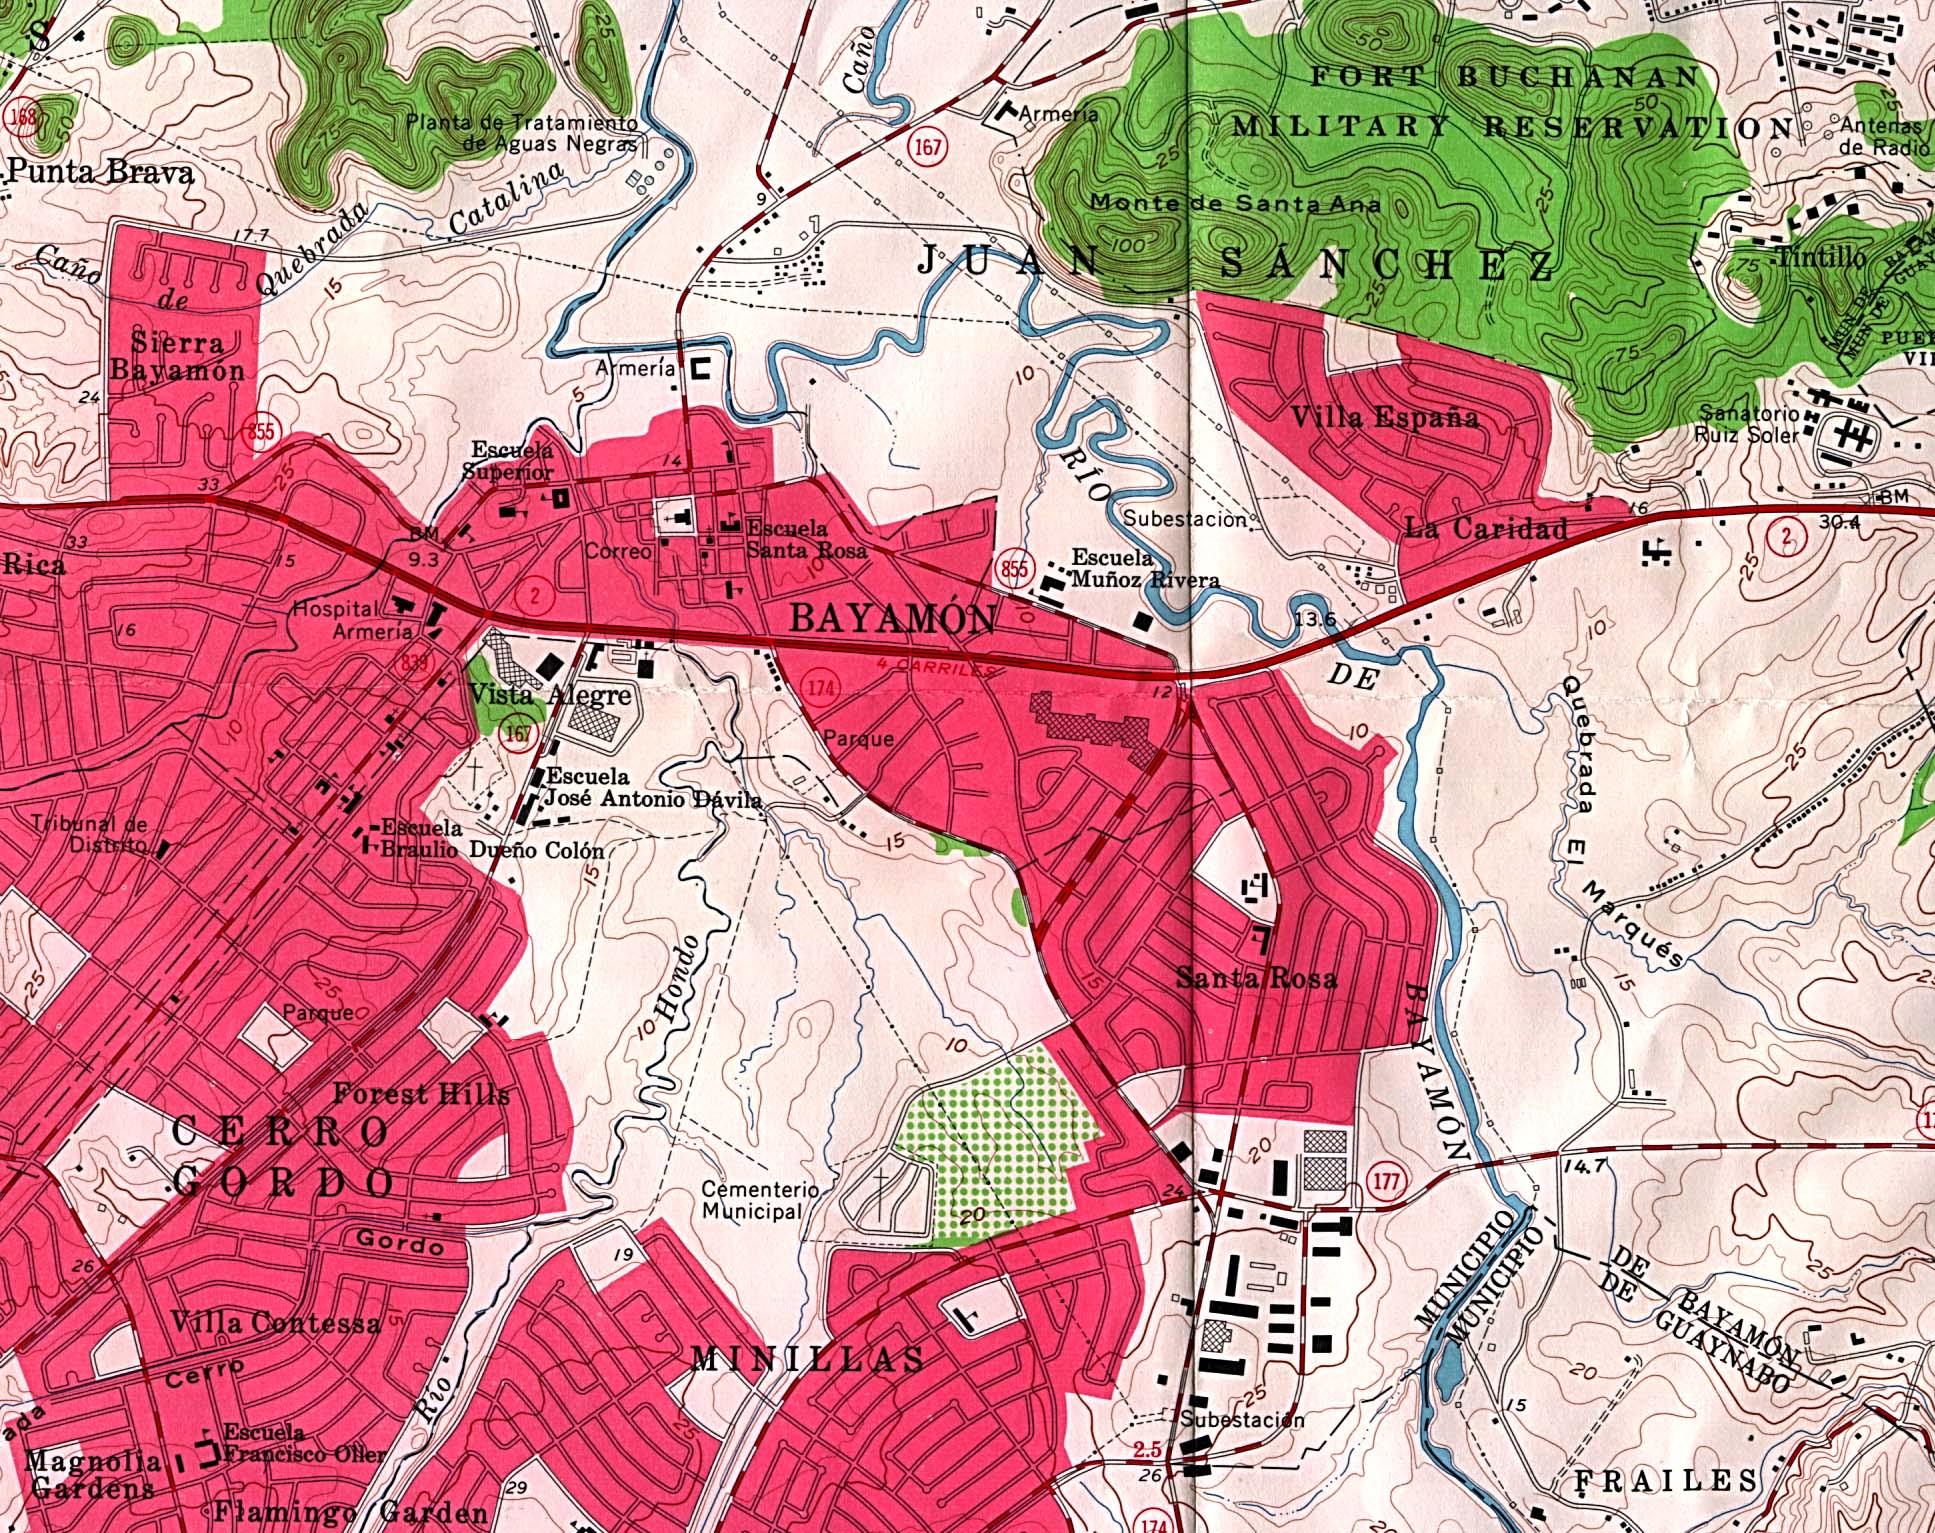 Bayamon City Map, Puerto Rico